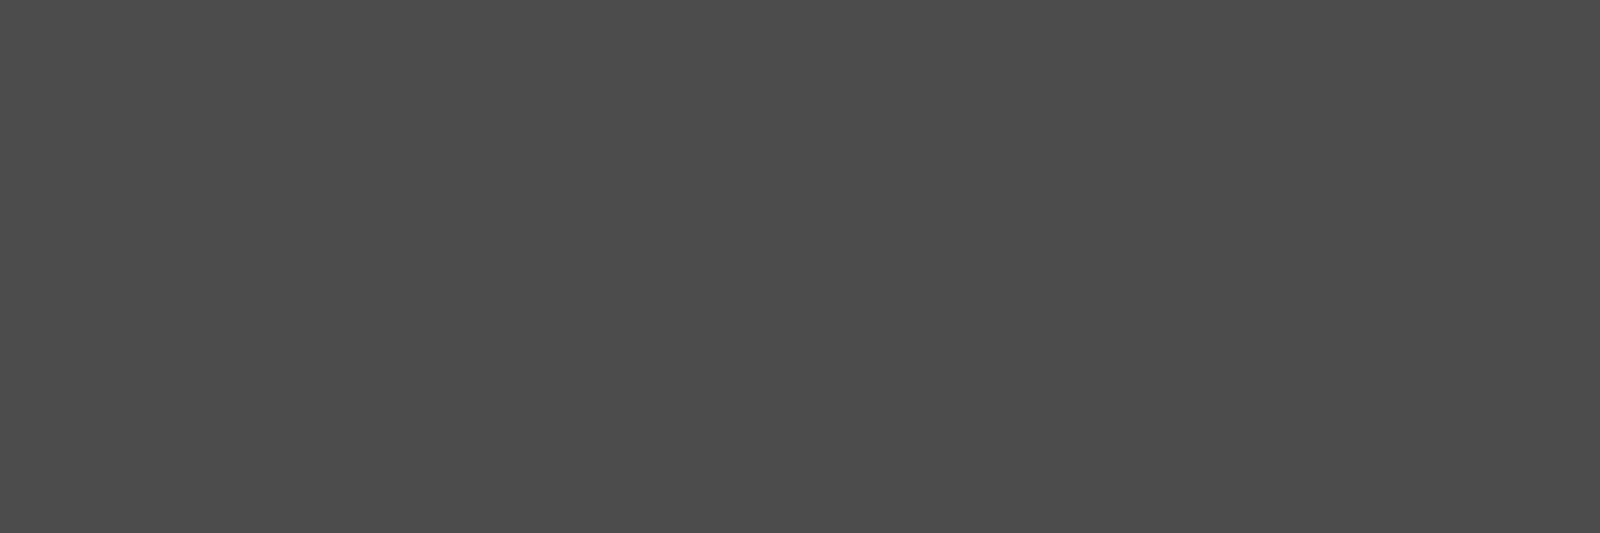 Стенни плочки Eclettica Anthracite 40x120